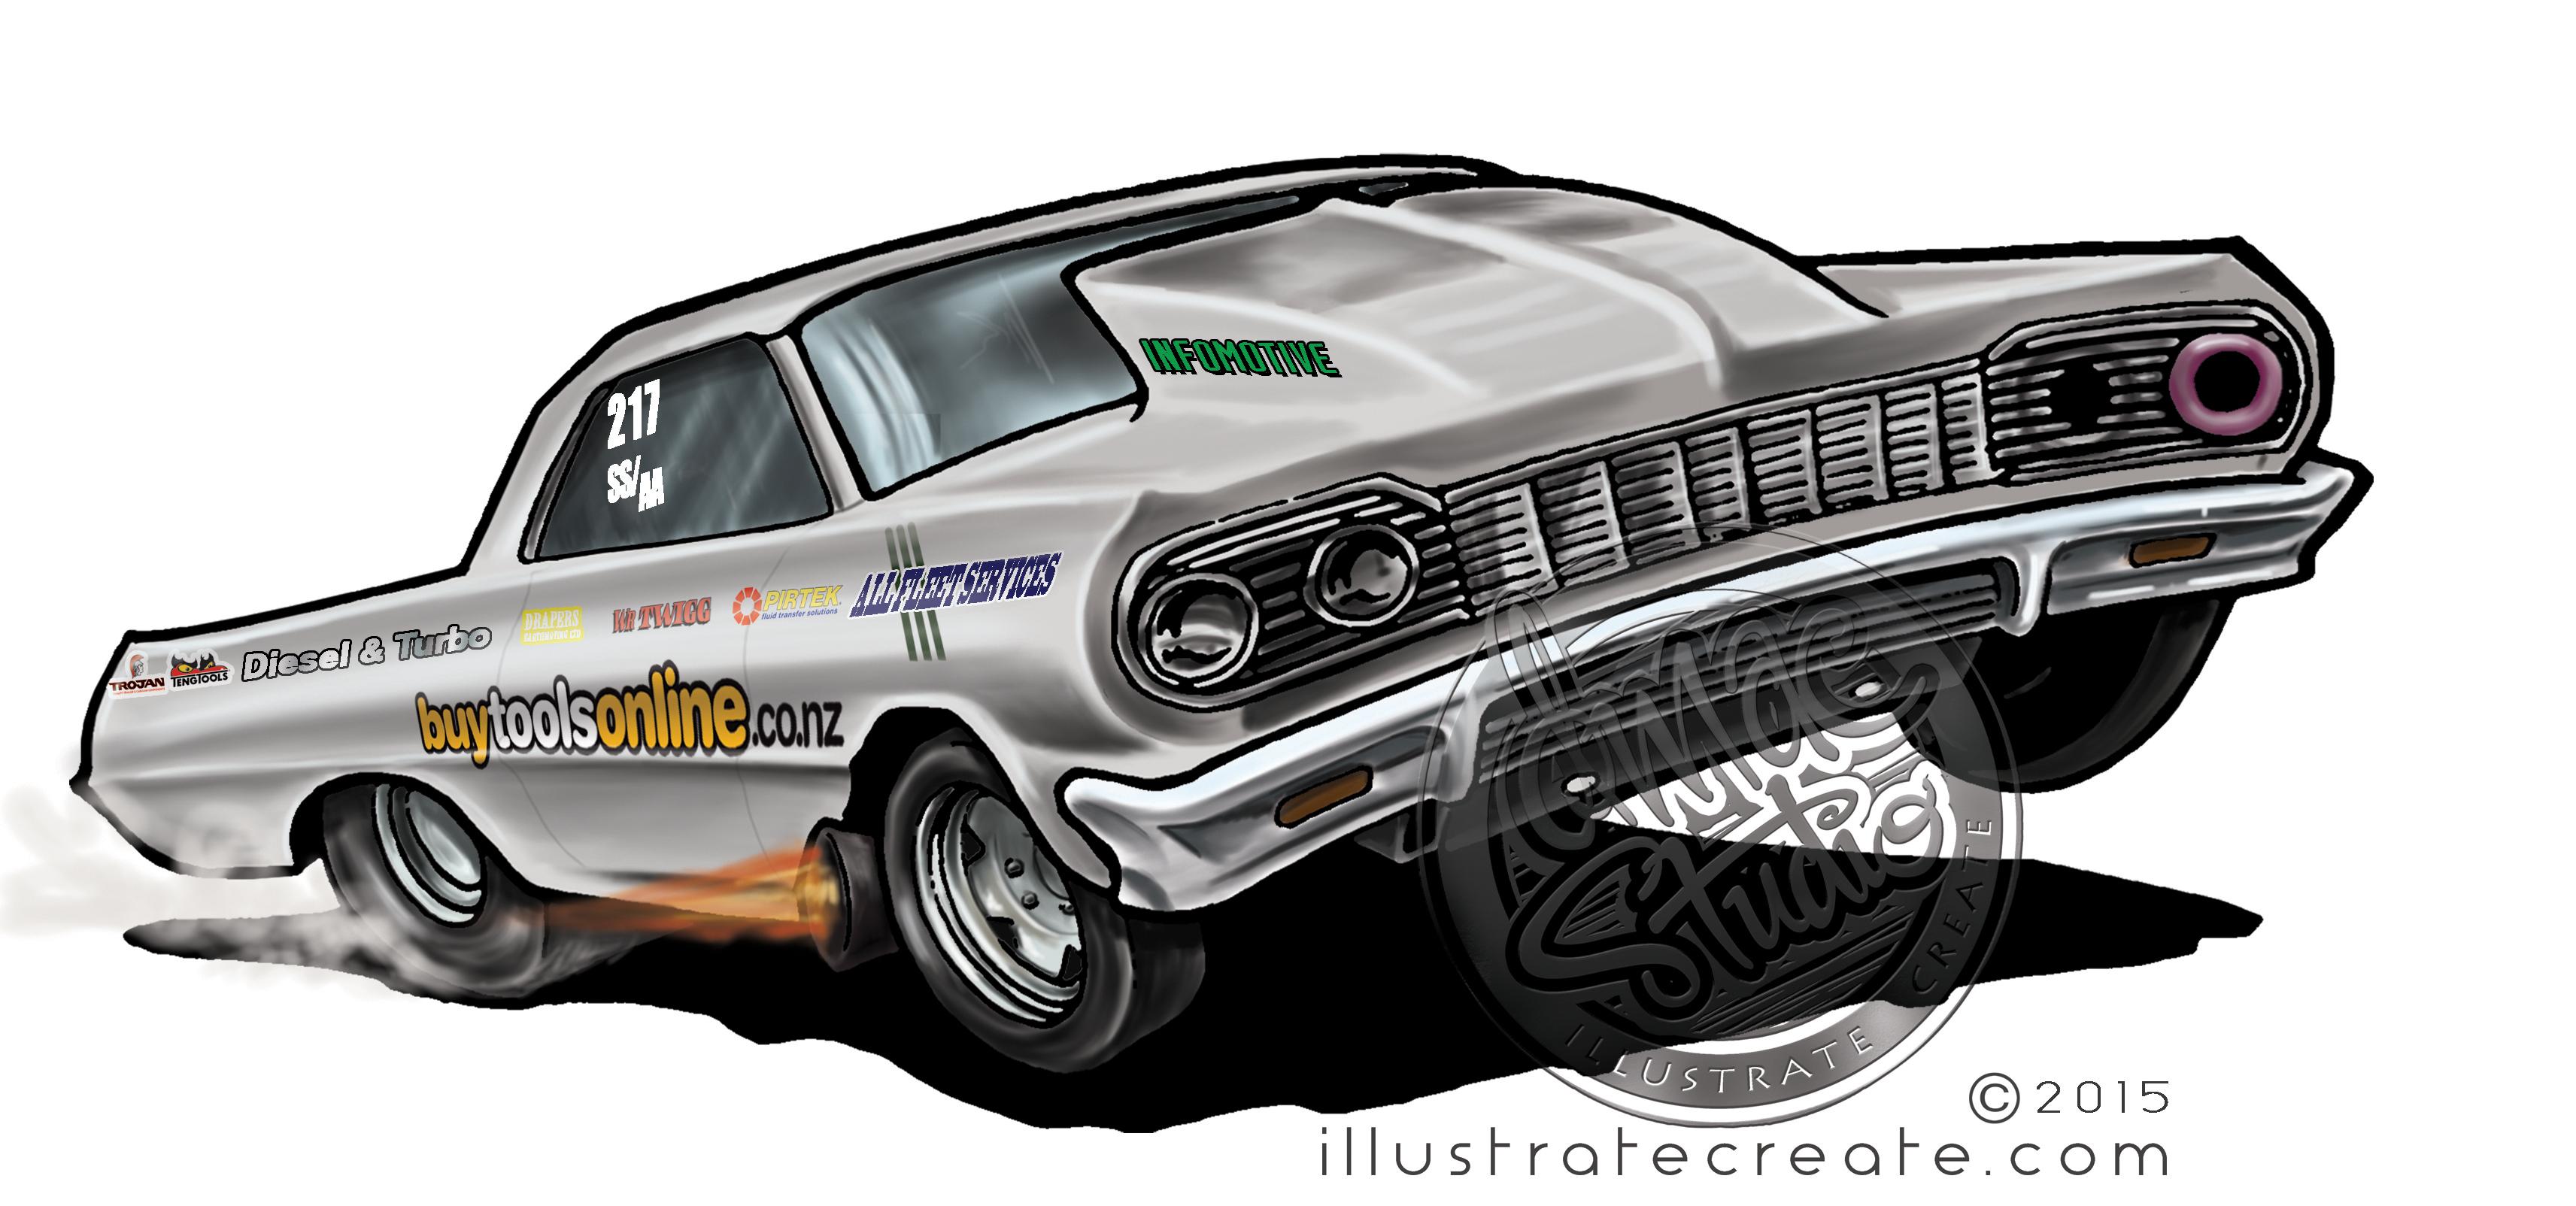 Cartoon drag car